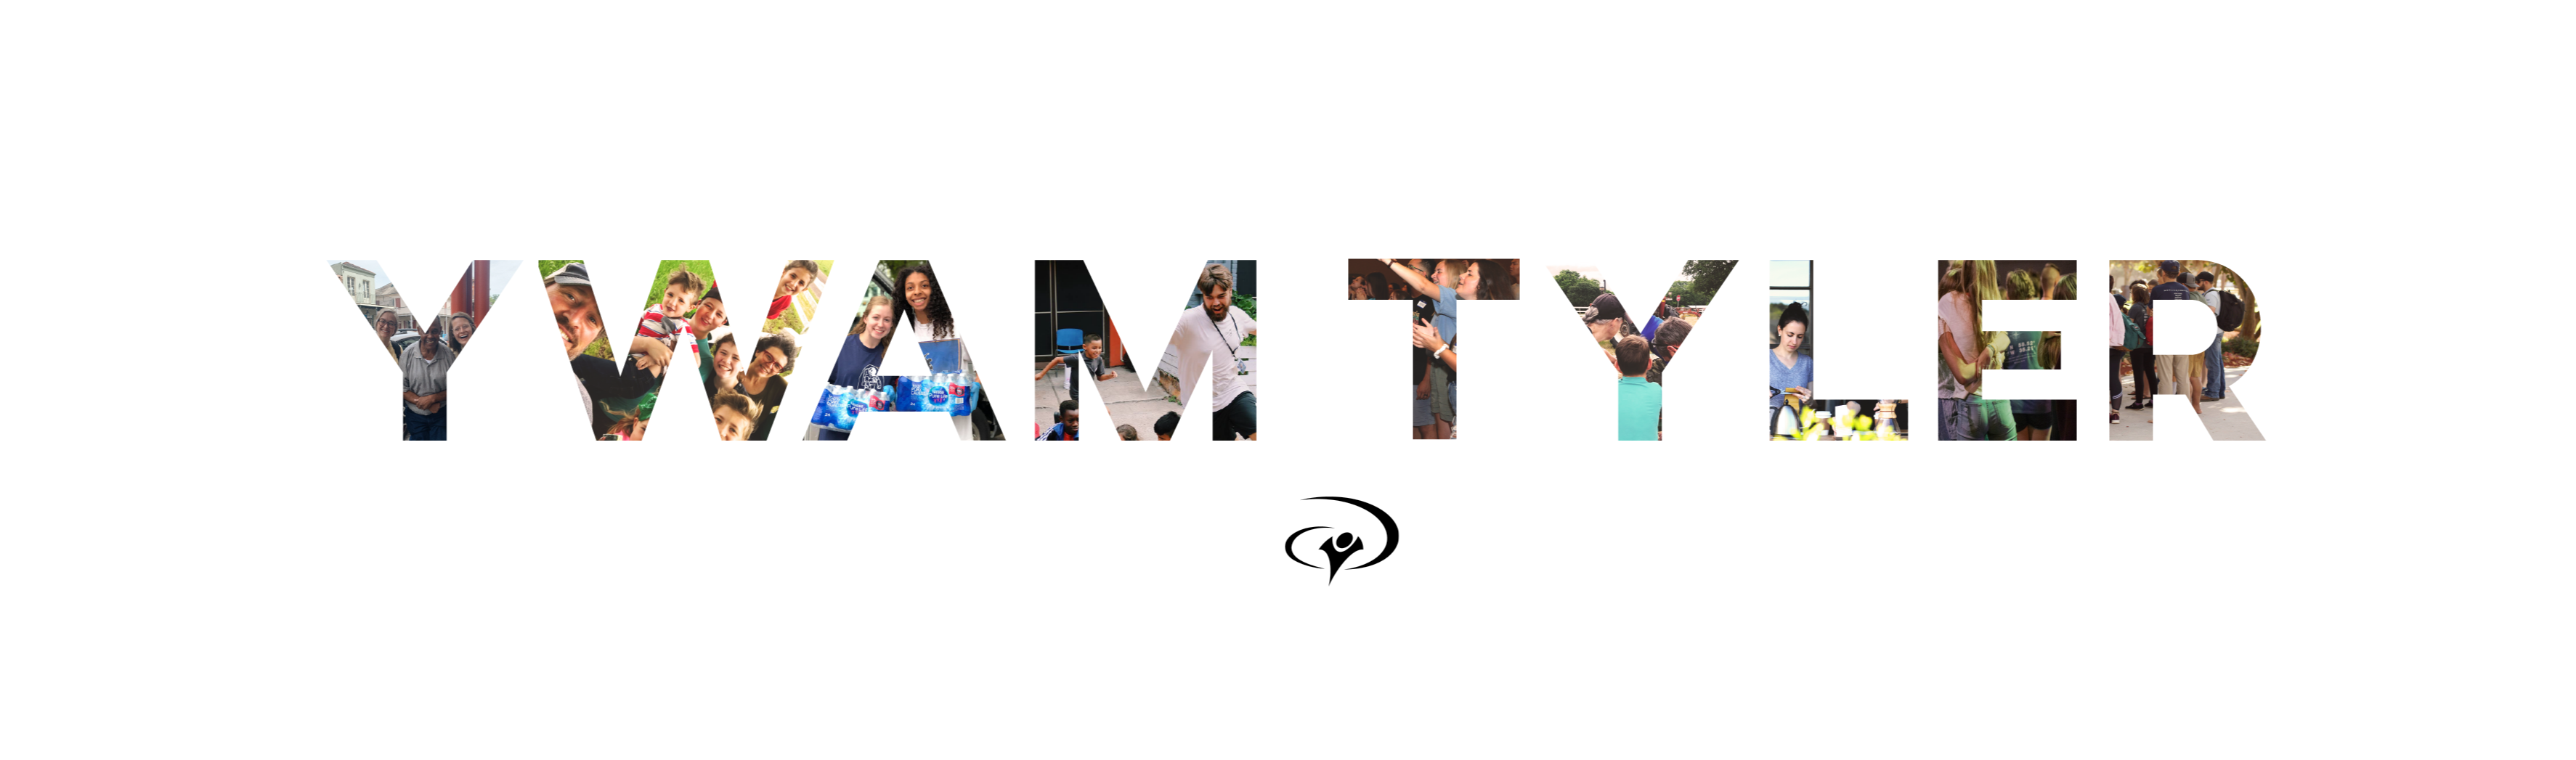 ywam-tyler-missionary-discipleship-training-program-logo-colors-1